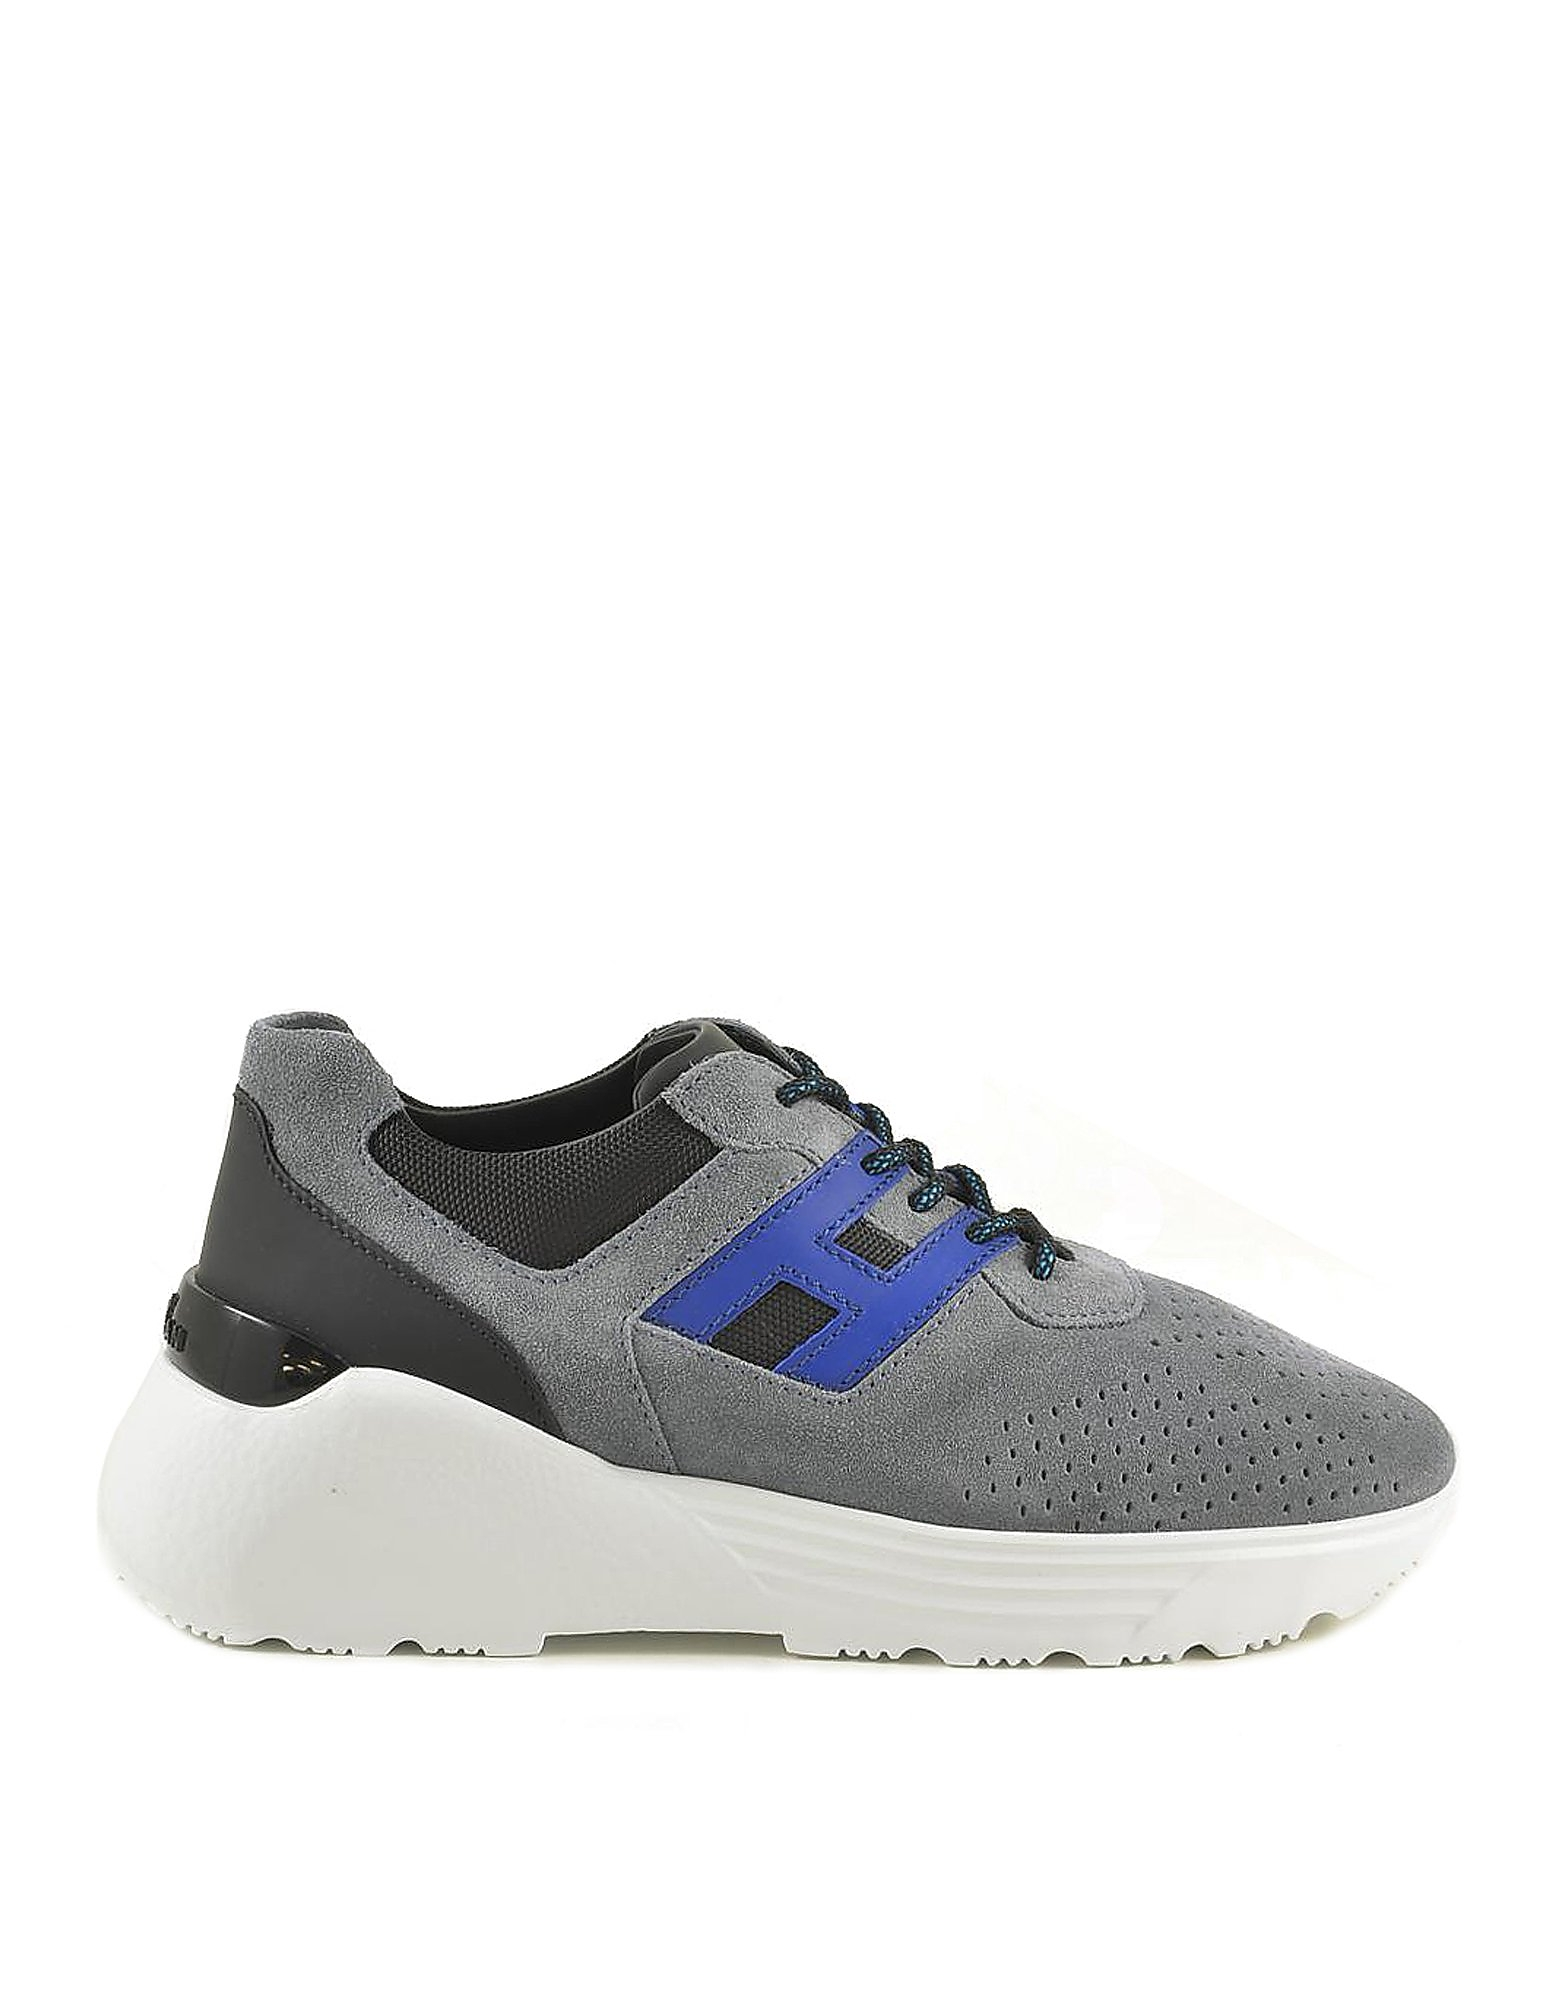 Hogan Designer Shoes, Men's Blue / Gray Sneakers